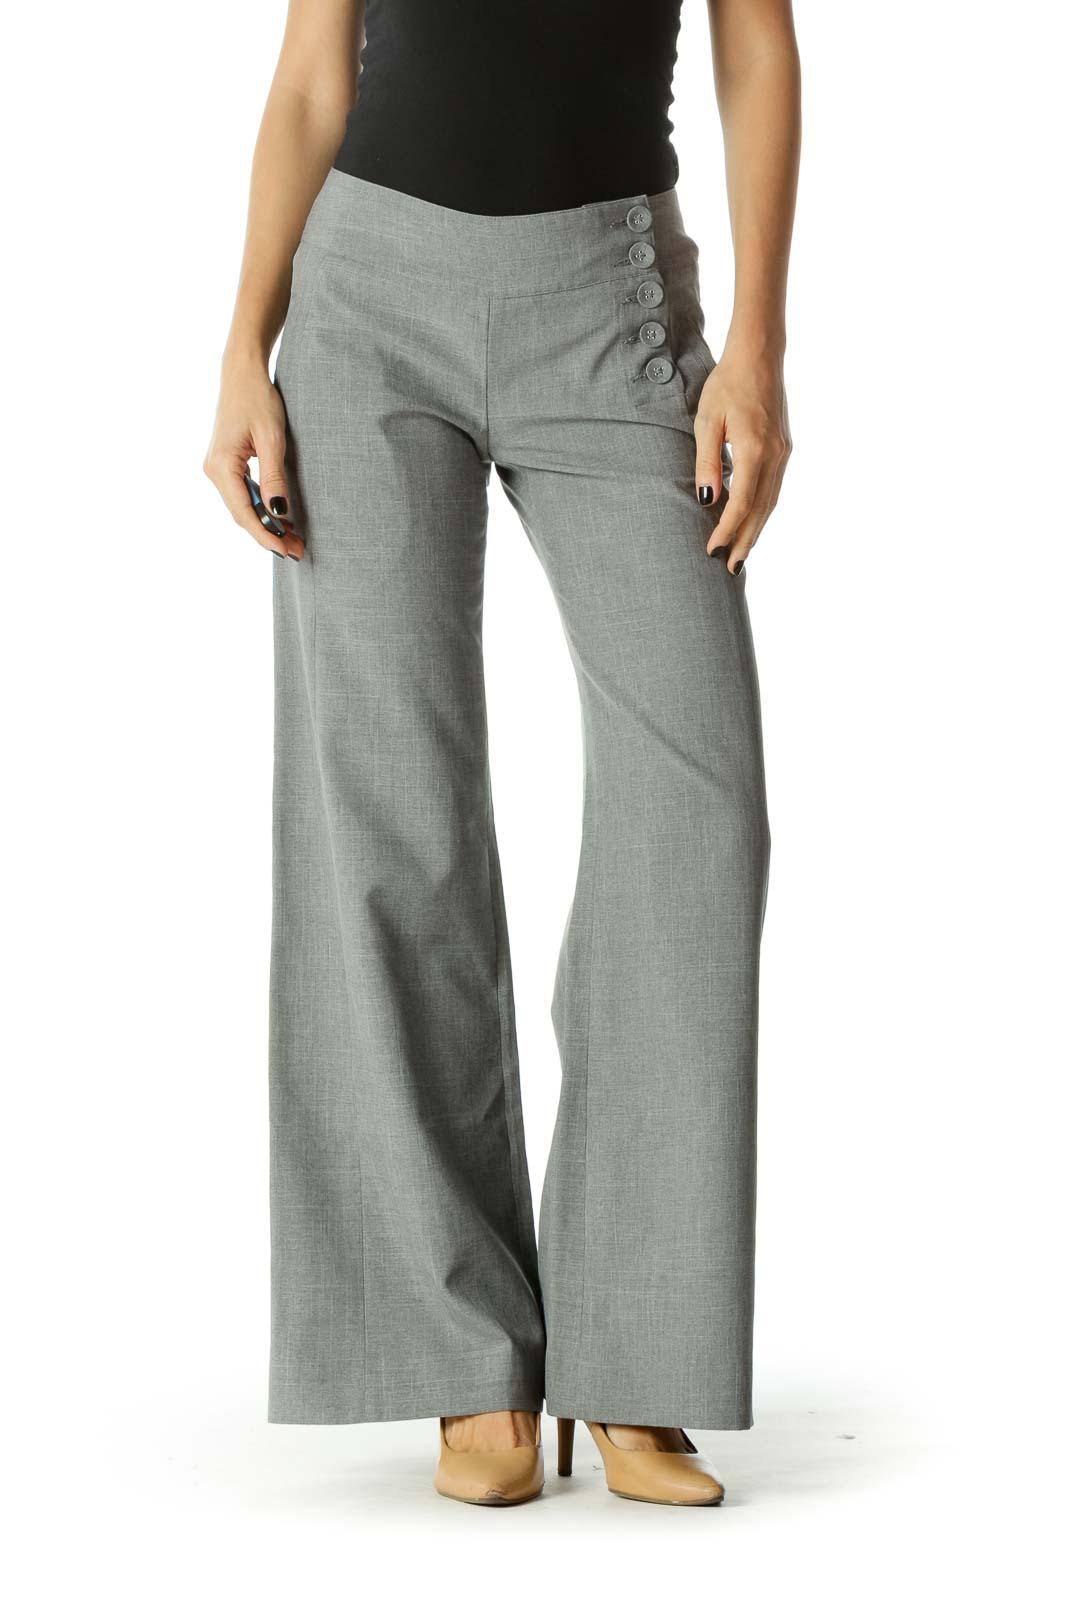 Gray Buttoned Details Wide Leg Pants Front